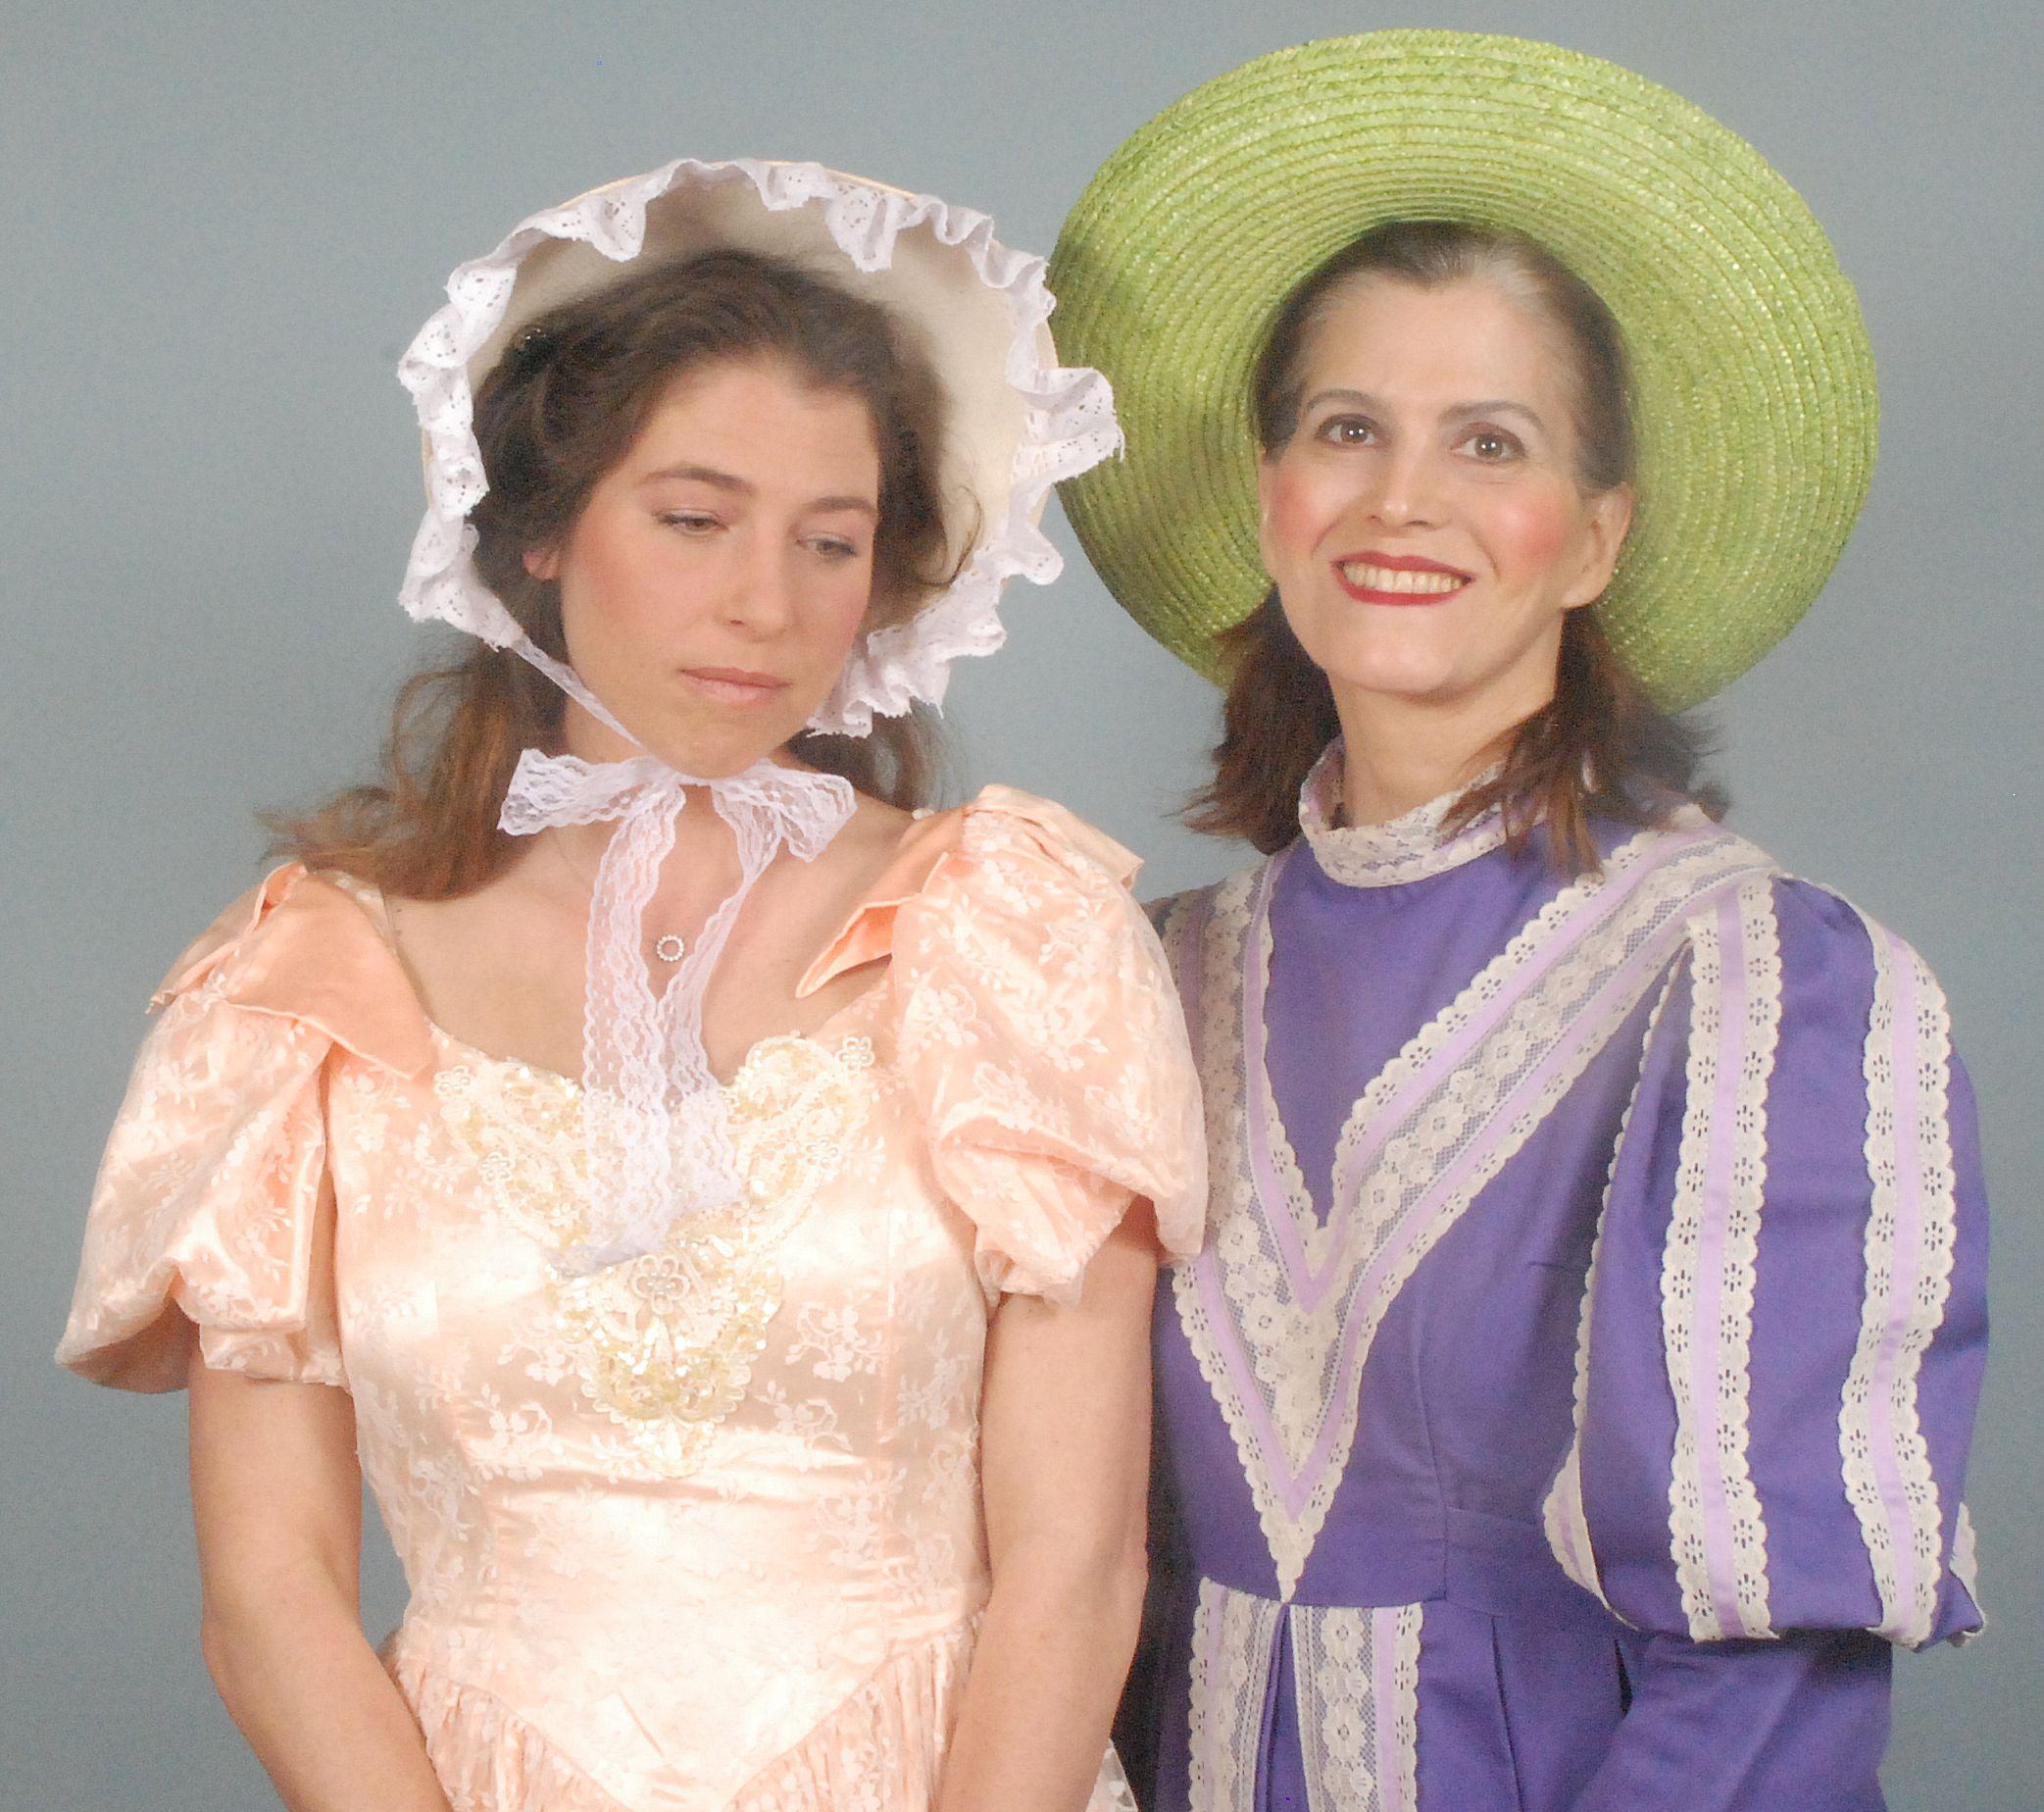 Brett Kroeger as Constance with Deborah Connelly as Mrs. Partlett